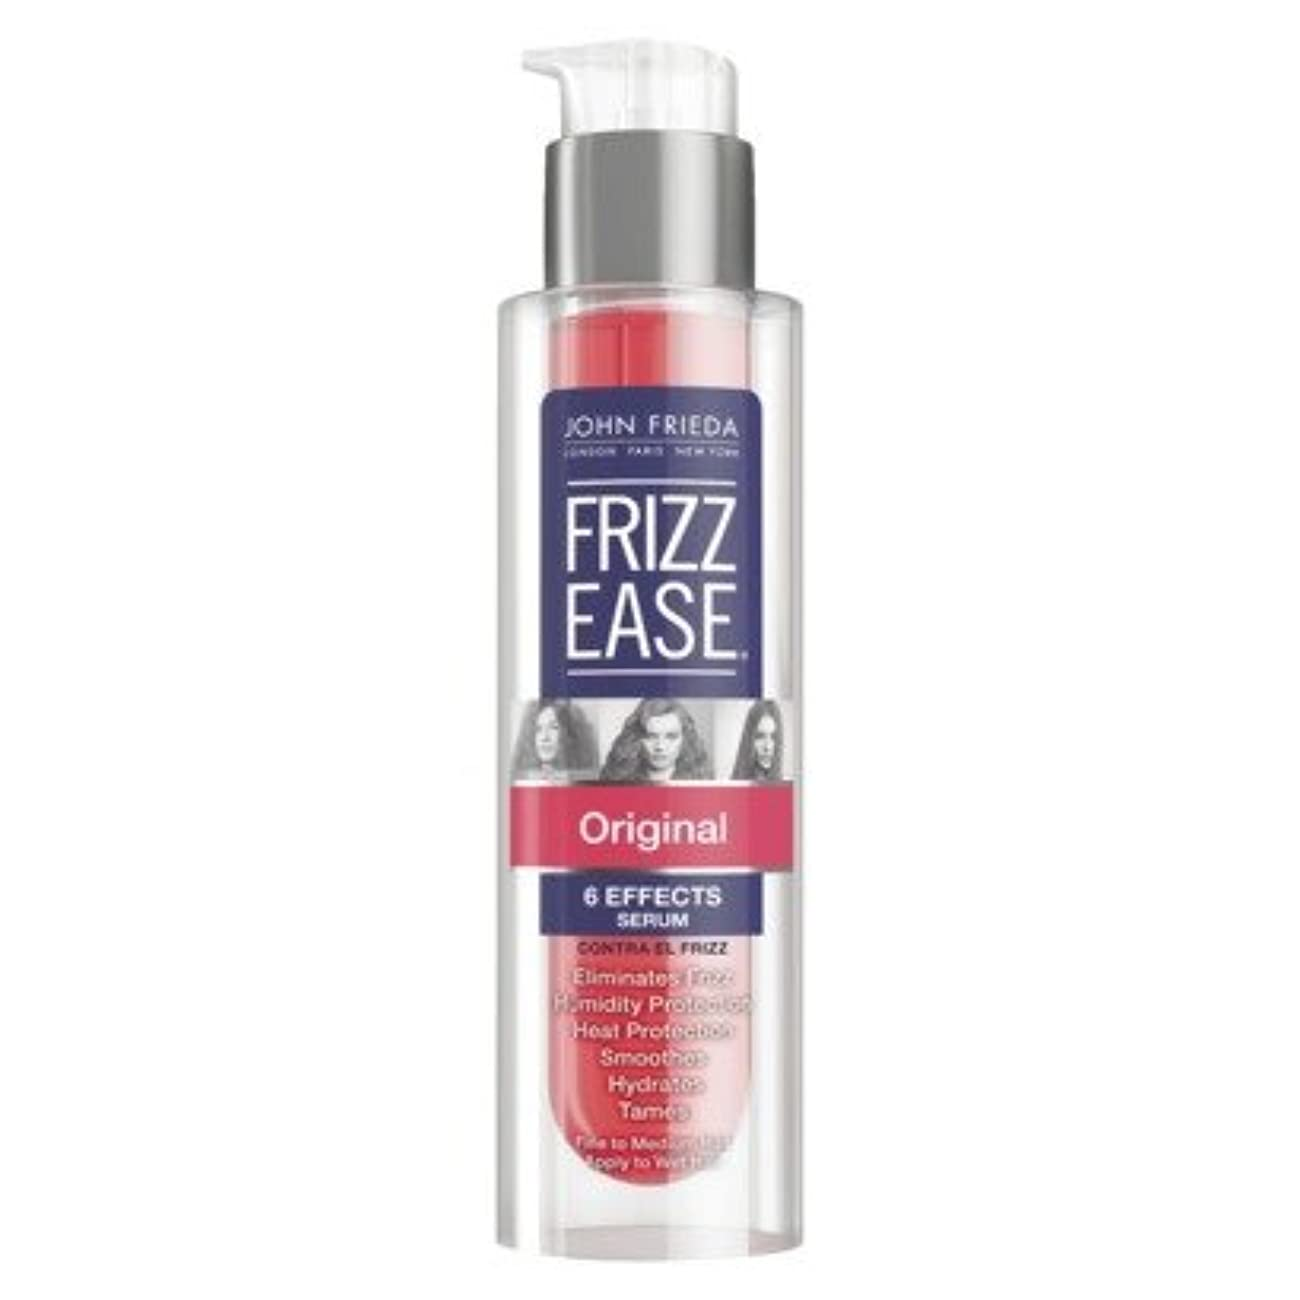 有毒到着赤面John Frieda Frizz-Ease Hair Serum, Original Formula - 1.69 fl oz (49ml)